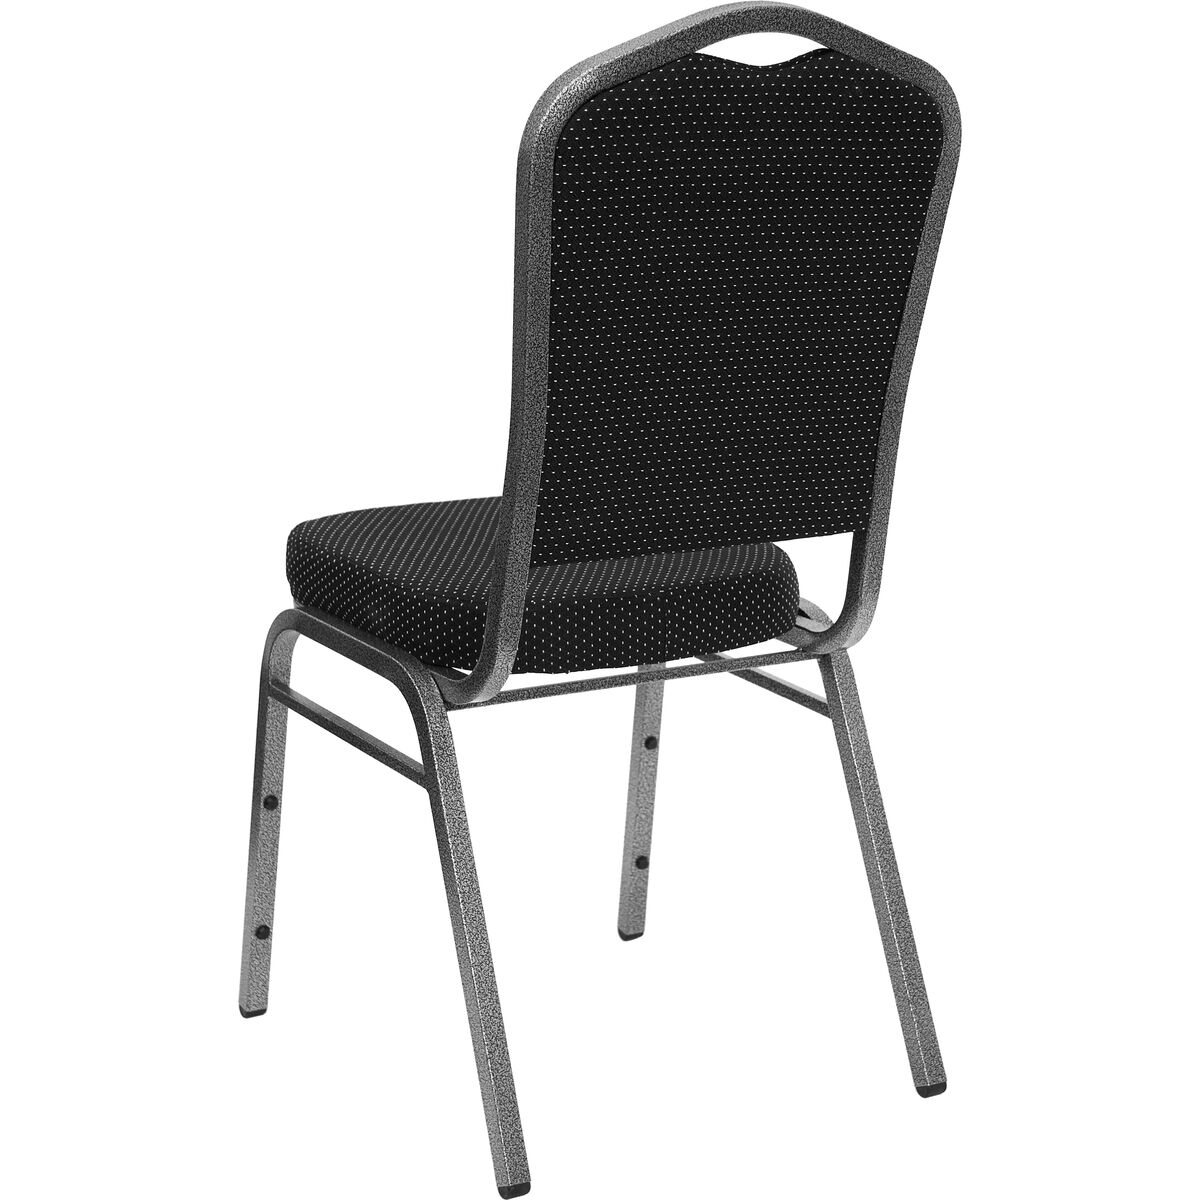 black fabric banquet chair fd c01 silvervein s076 gg. Black Bedroom Furniture Sets. Home Design Ideas